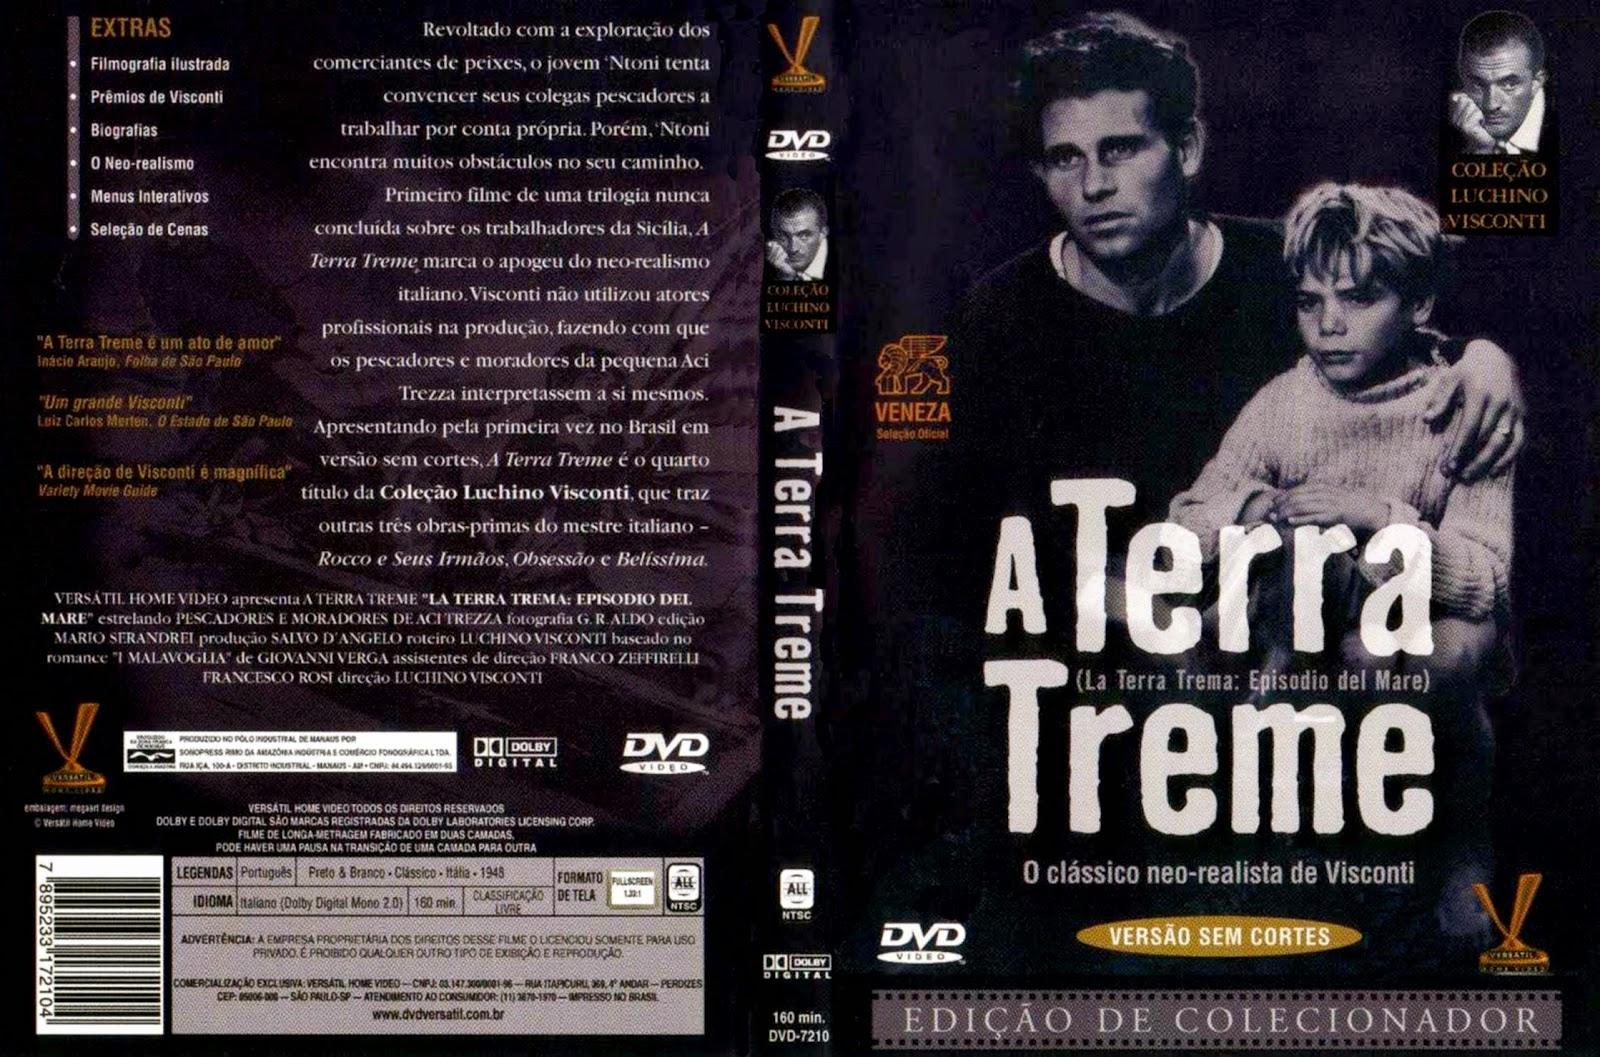 Capa DVD A Terra Treme